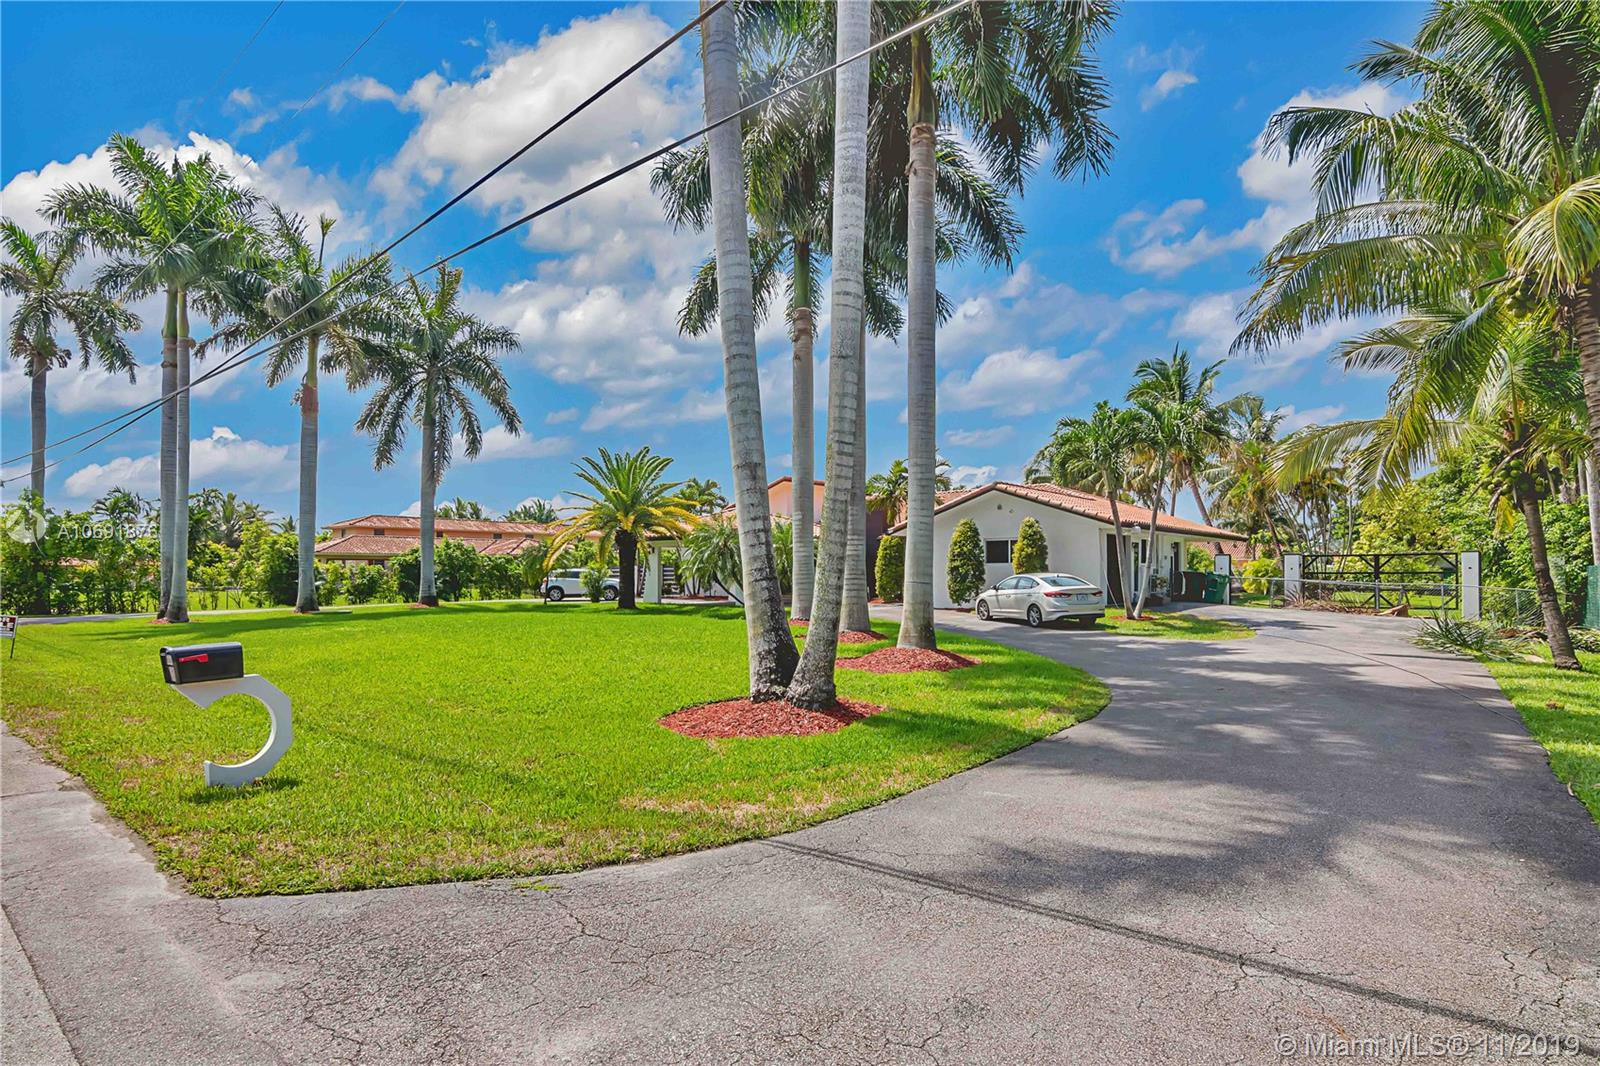 10144 NW 137th St, Hialeah Gardens, FL 33018